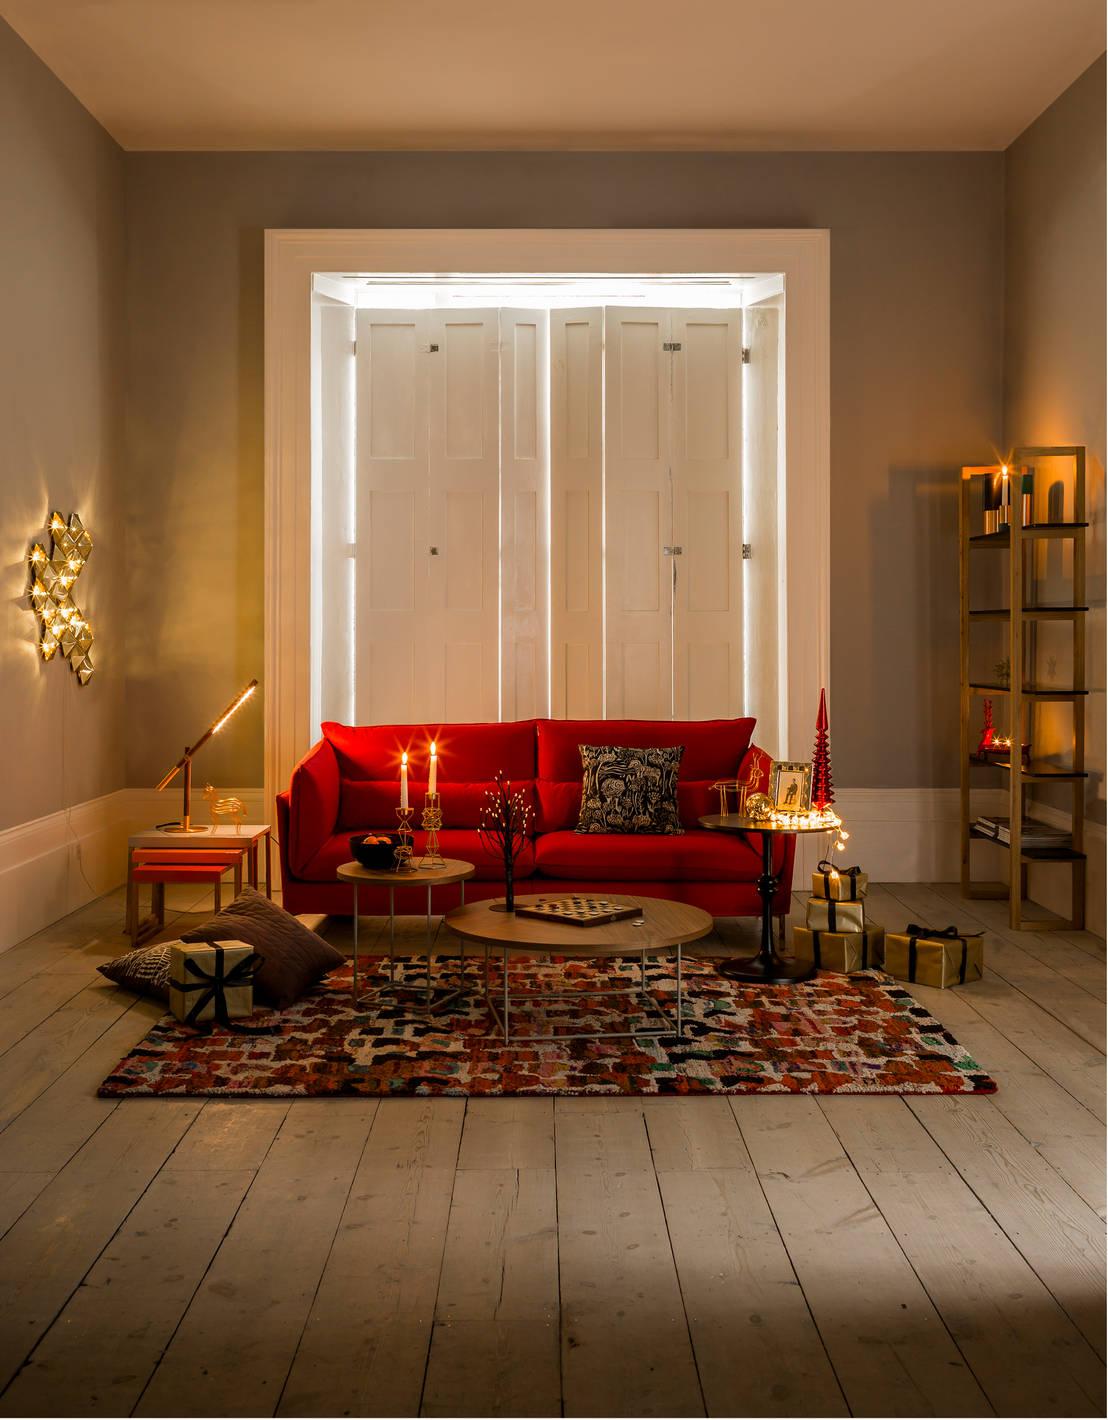 weihnachten in italien. Black Bedroom Furniture Sets. Home Design Ideas